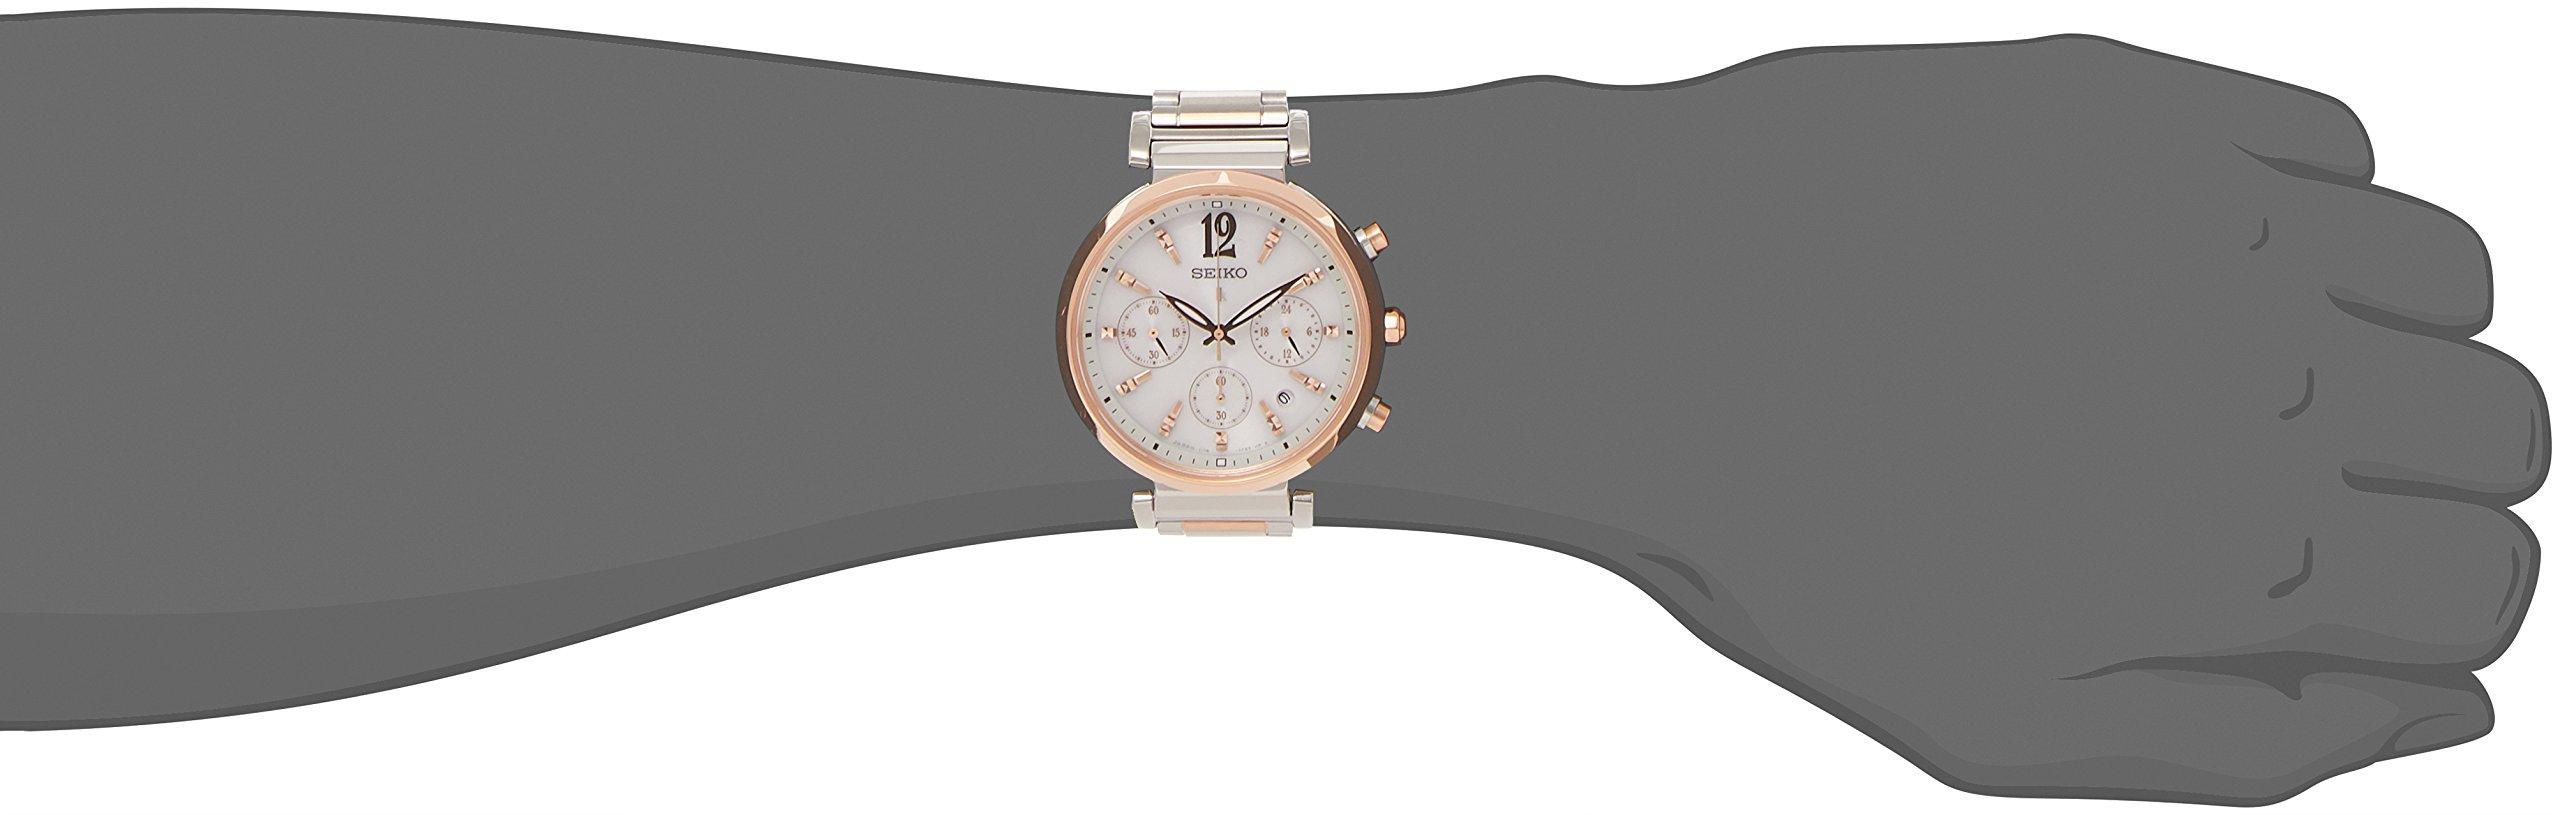 LUKIA solar watch SEIKO chronograph ladies type SSVS034 popularity by LUKIA